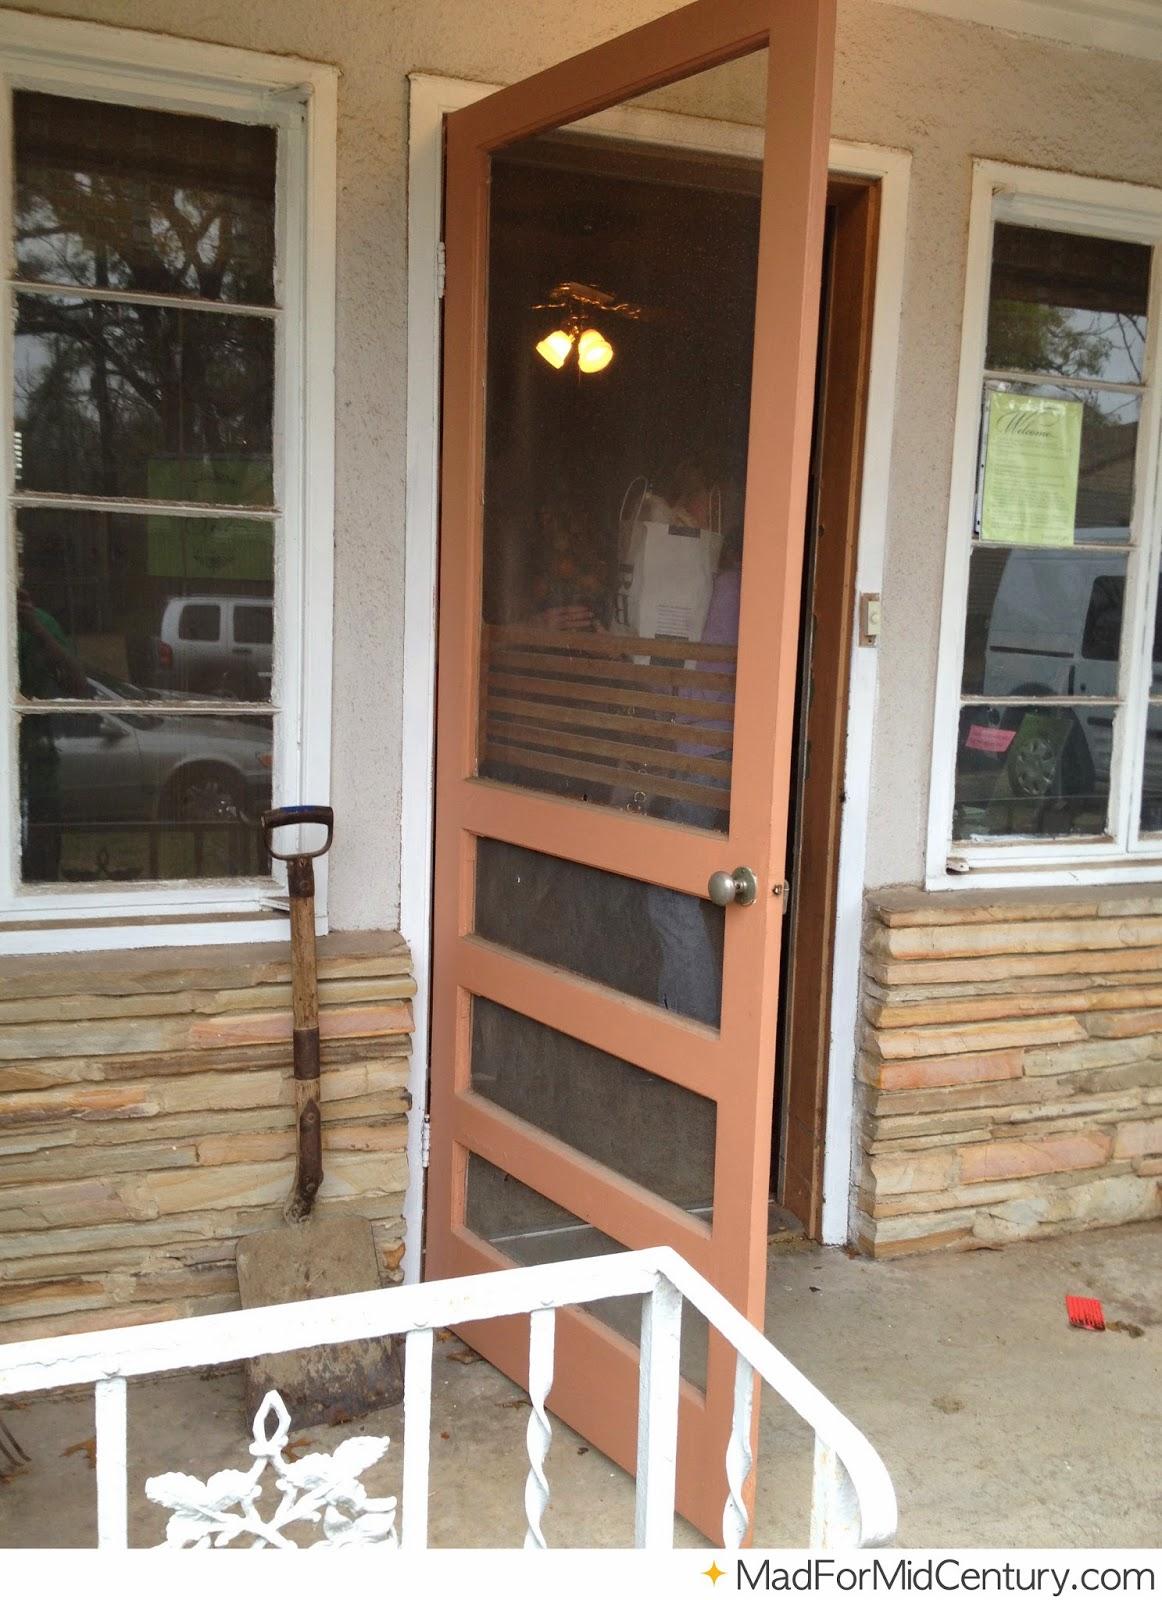 Vintage Screen Doors : Mad for mid century brown vintage screen door on a